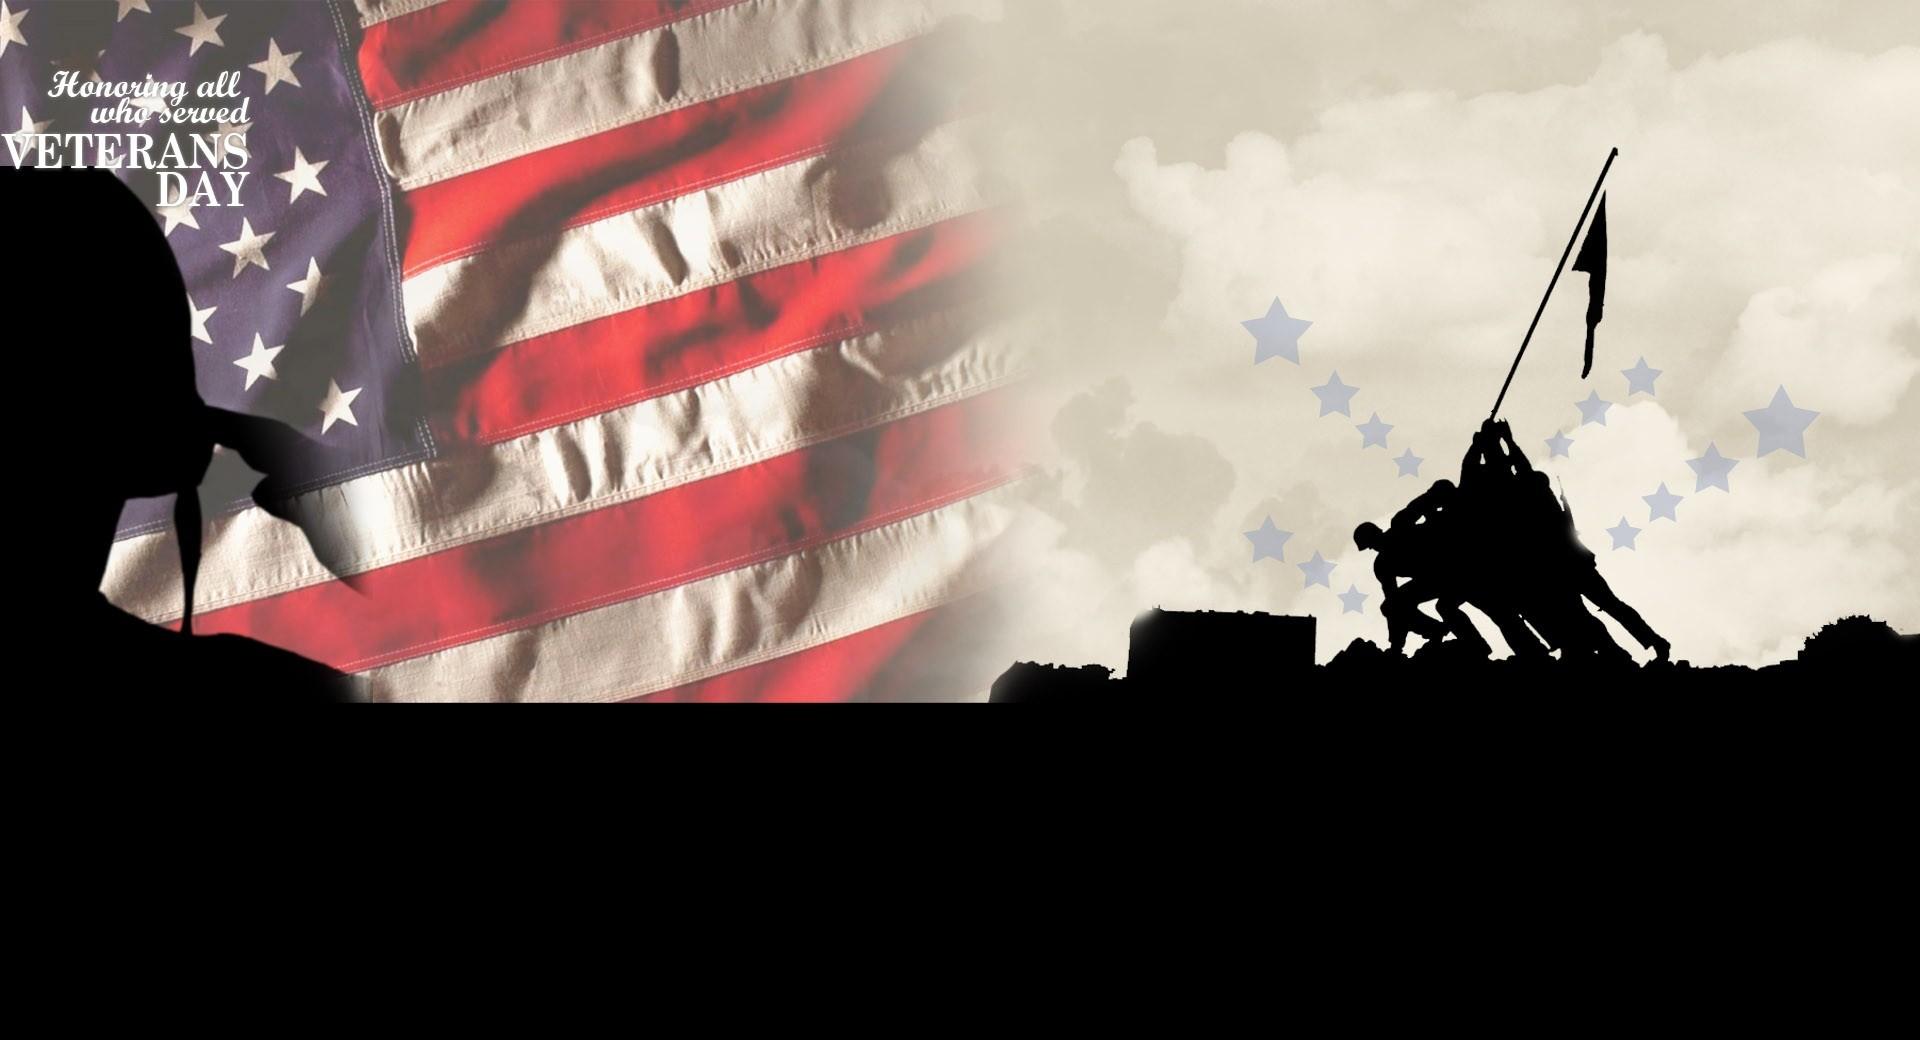 Veterans Memorial Day Background High Definition Wallpaper 1920x1040